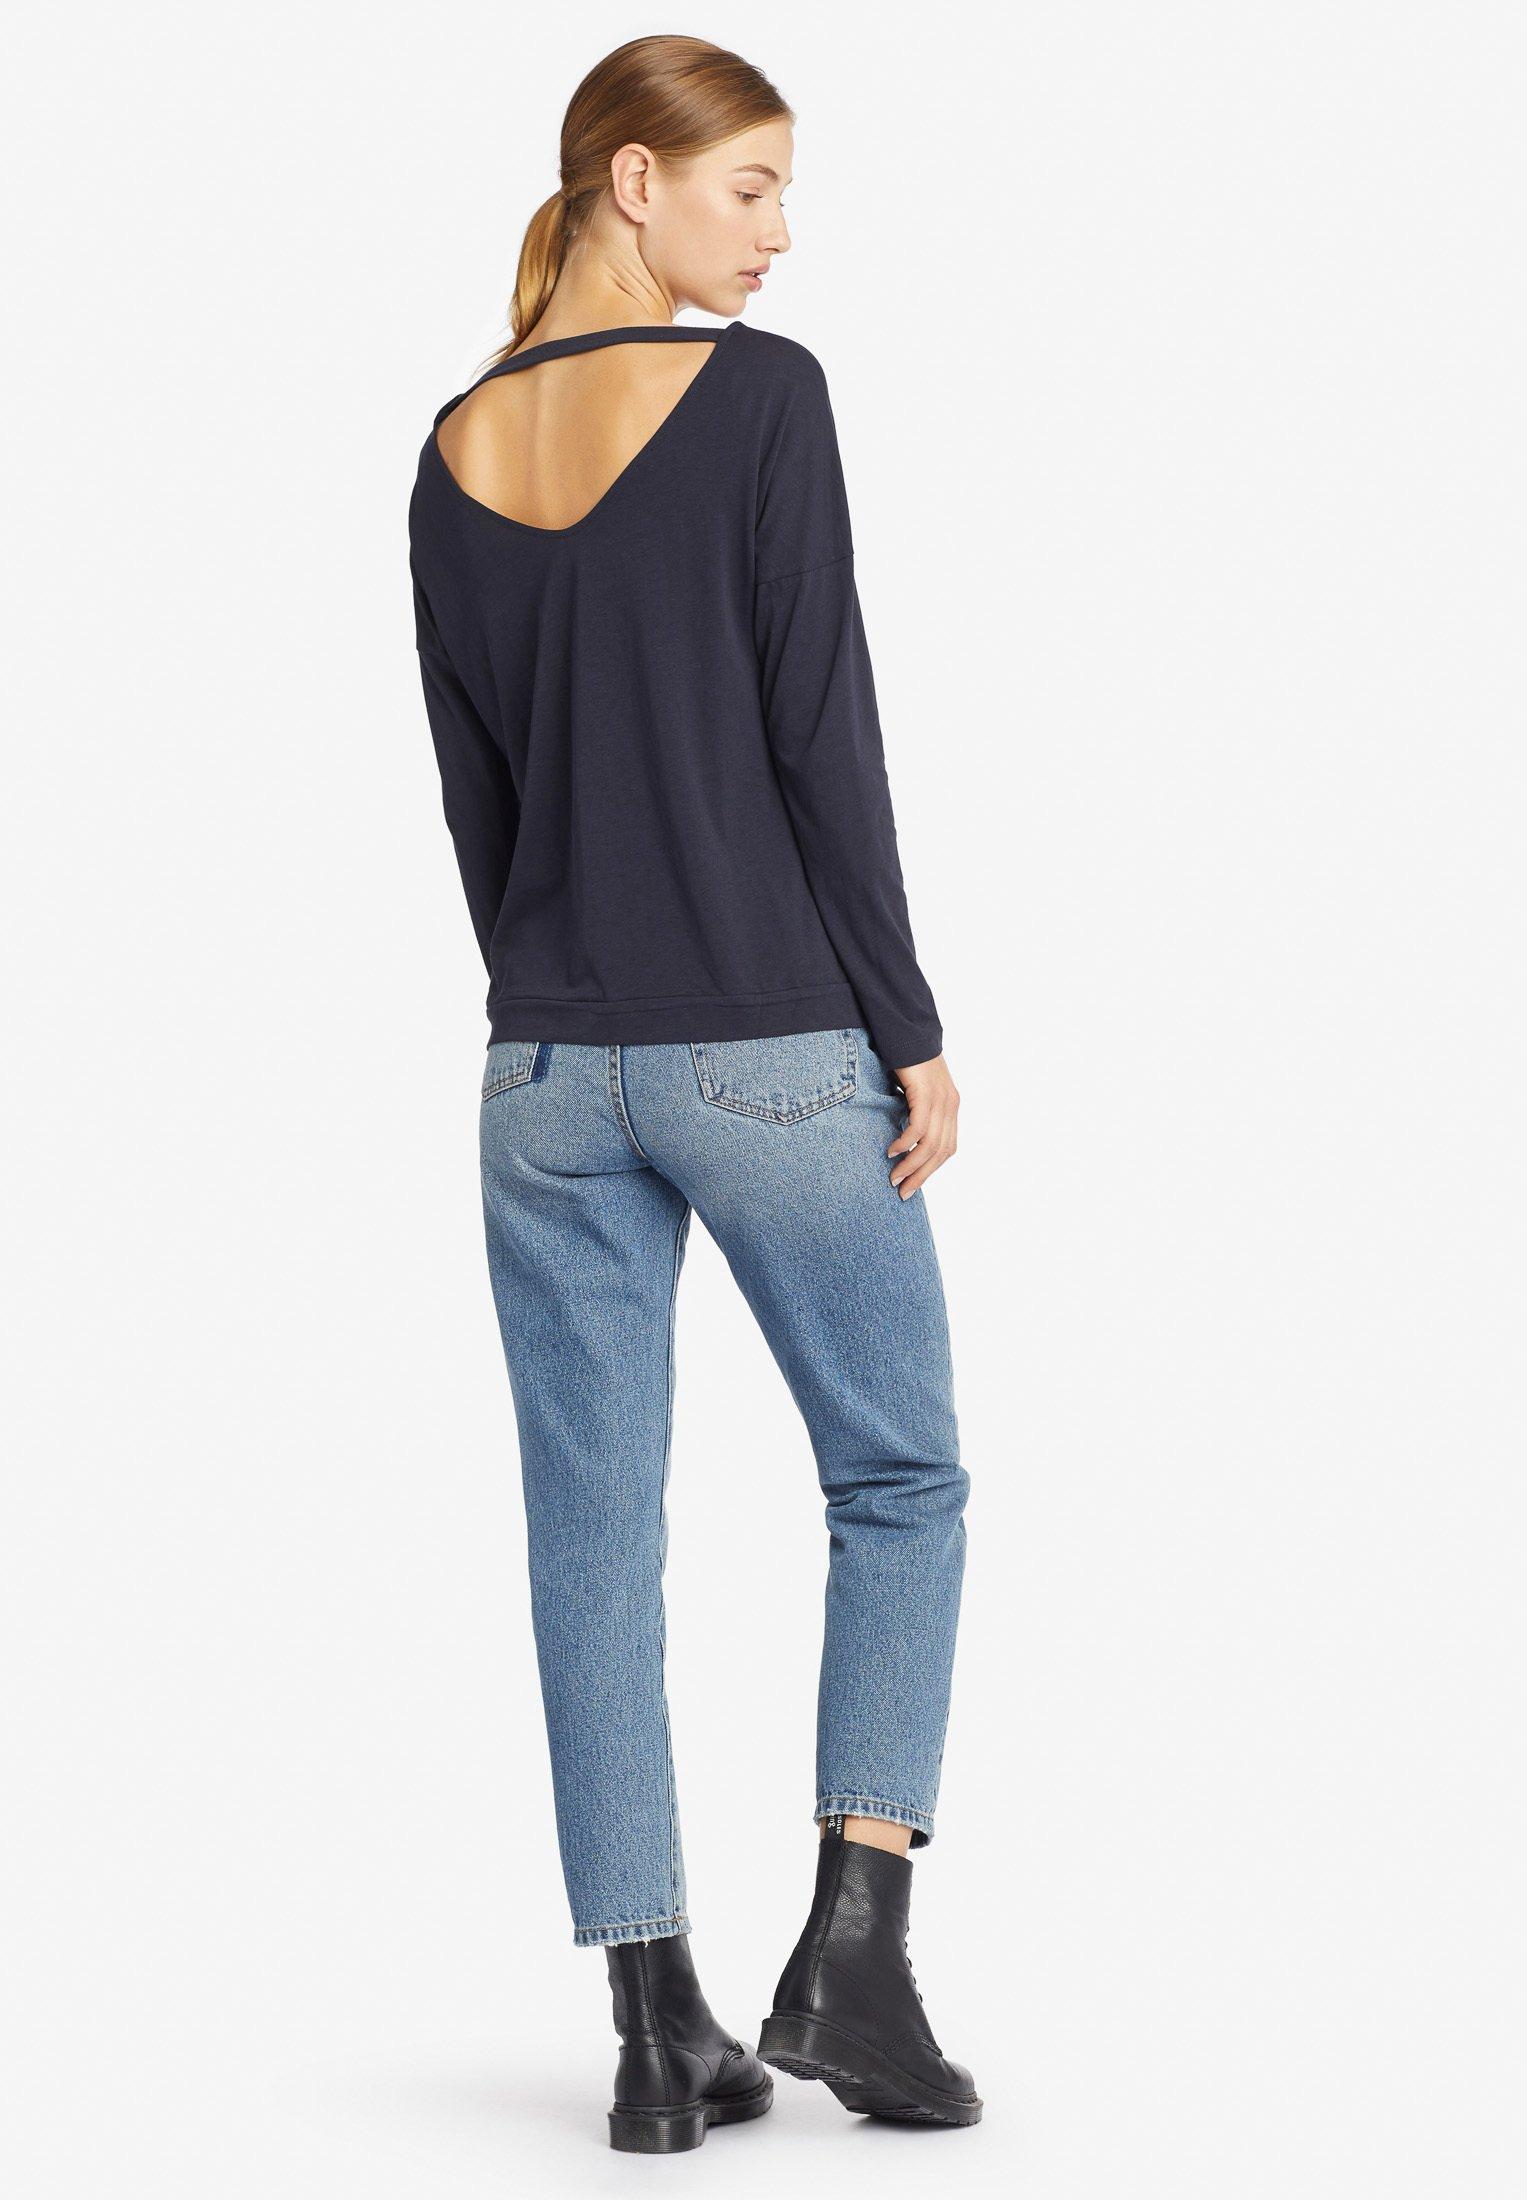 manches TASGAT longues à blue dark shirt khujo 3RjSAq5Lc4